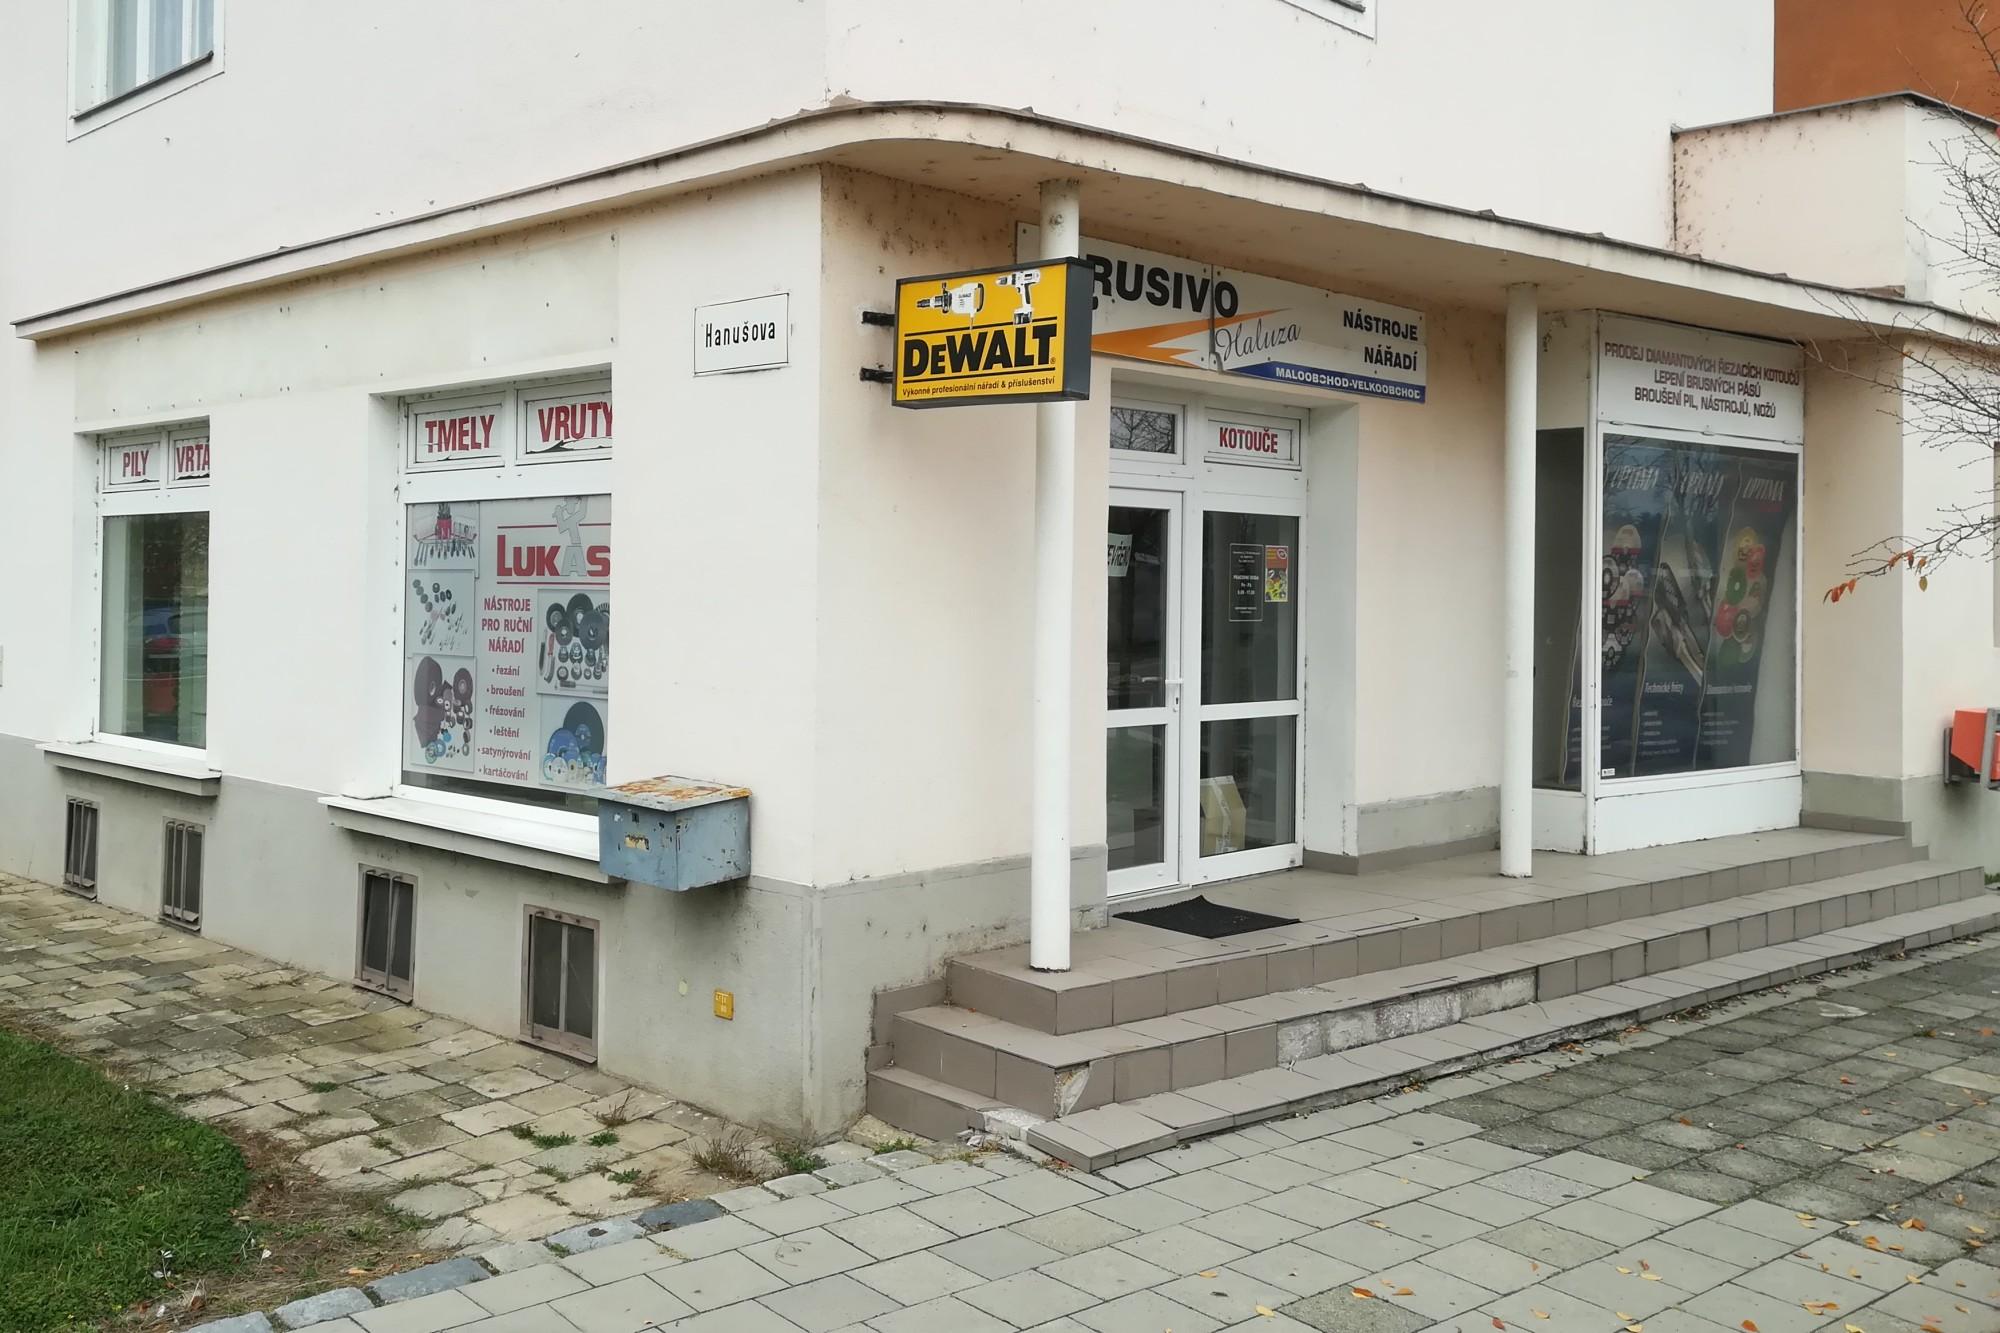 Sběrné místo BRUSIVO HALUZA - Olomouc